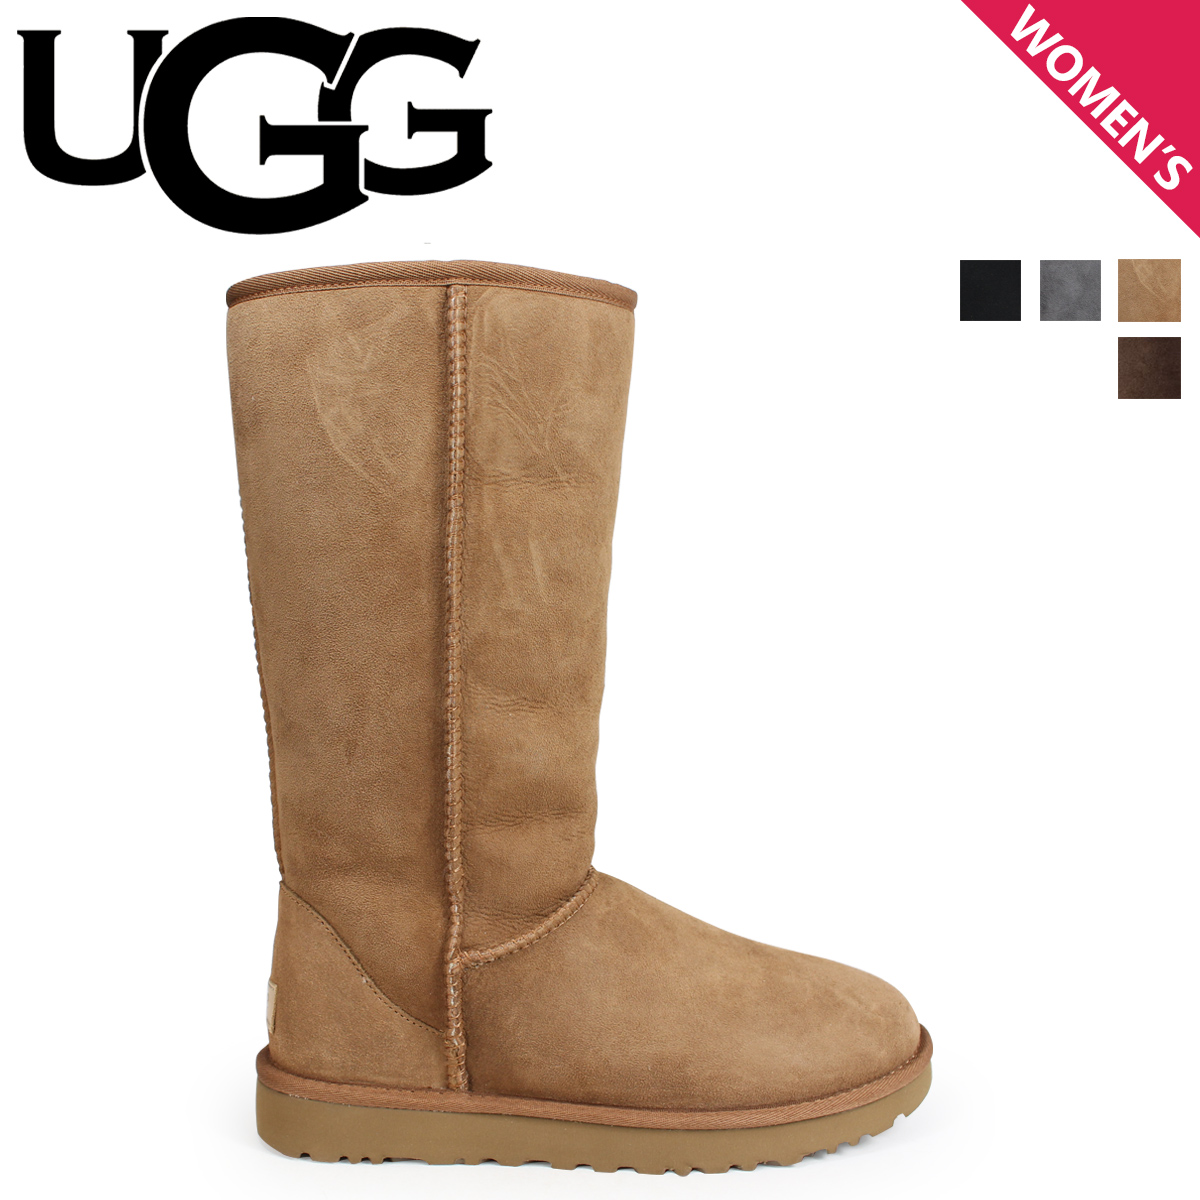 2b607bc78b07 Sugar Online Shop  アグ UGG mouton boots classical music Thor ...